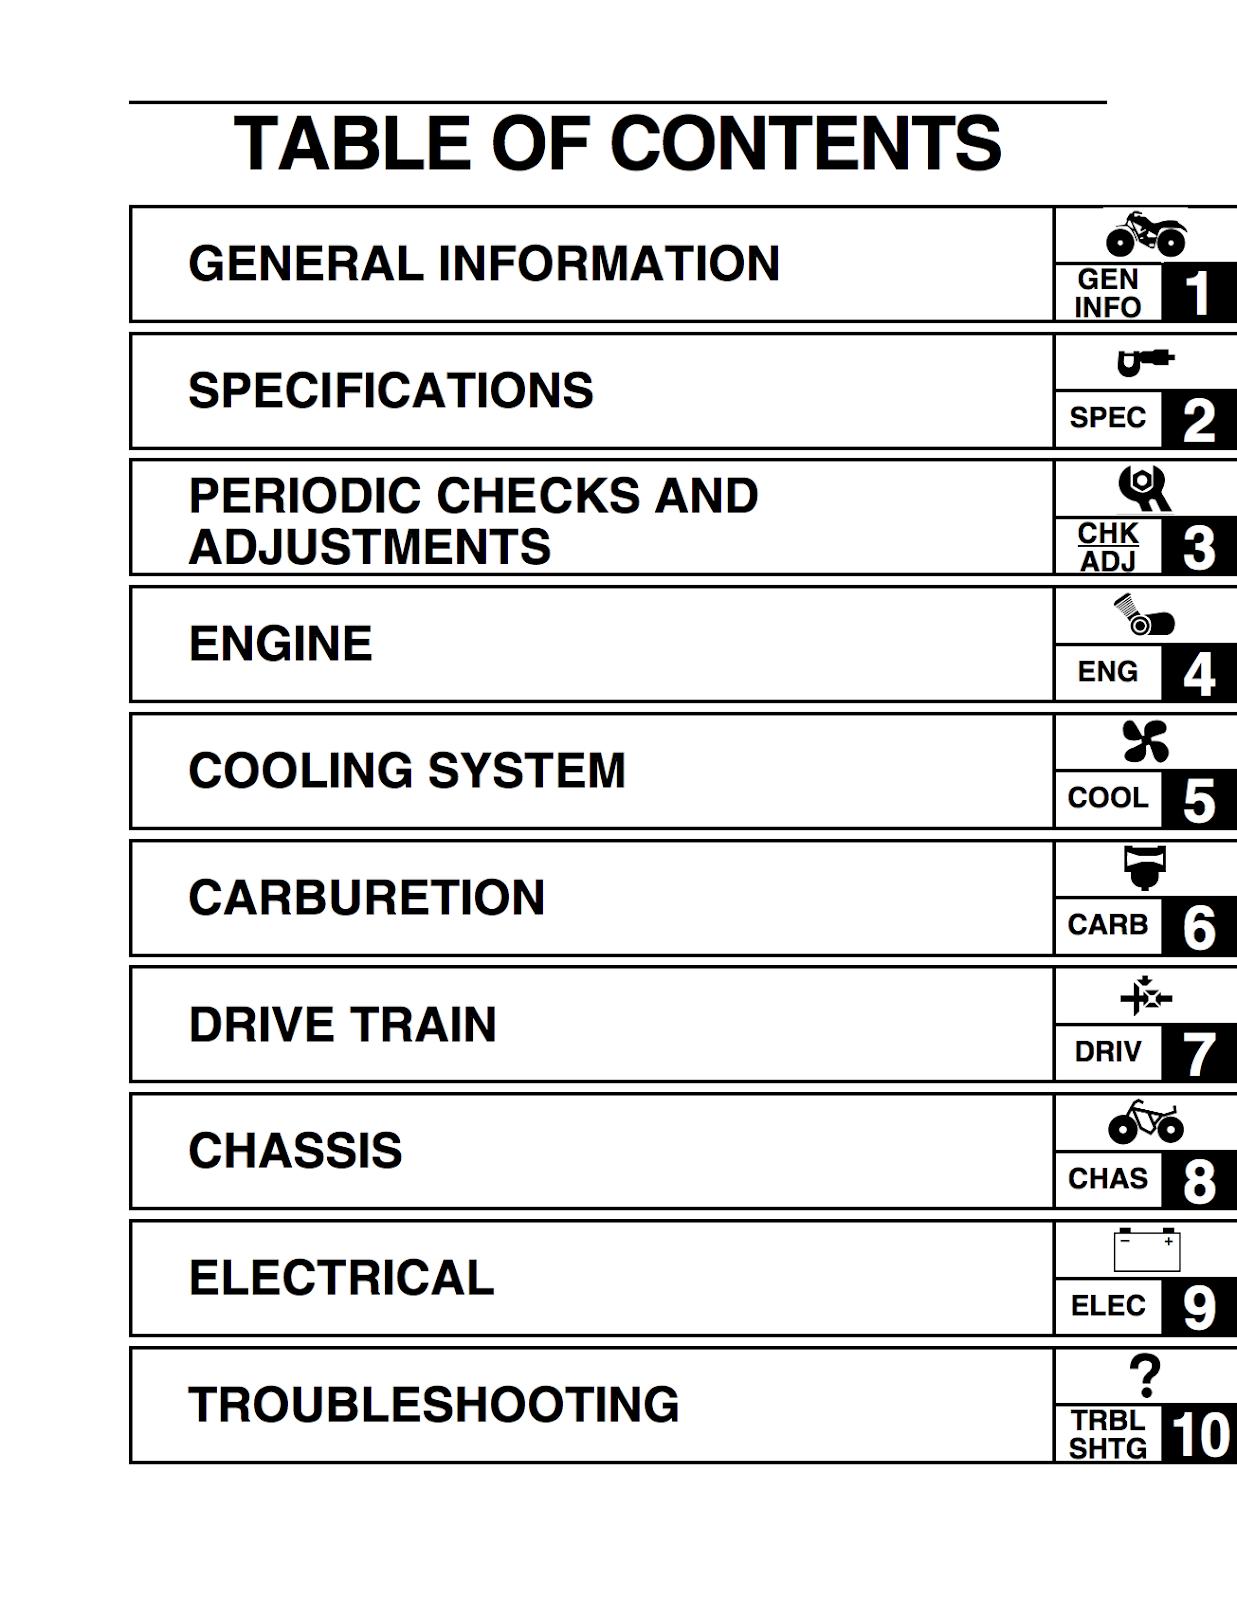 Download Yamaha Wolverine 450 Repair Manual on yamaha wolverine ignition explained, yamaha wolverine wheels, yamaha rhino wiring schematic, polaris xpedition 425 wiring diagram, ford mustang wiring diagram, kawasaki bayou wiring diagram, king quad wiring diagram, yamaha raptor 660 wiring-diagram, yamaha wolverine parts list, yamaha virago wiring-diagram, yamaha r1 wiring-diagram, yamaha banshee wiring-diagram, yamaha wolverine accessories, polaris sportsman wiring diagram, yamaha grizzly 660 wiring-diagram, kodiak wiring diagram, arctic cat wiring diagram, yamaha wolverine 350, can am outlander wiring diagram, yamaha wolverine oil filter,